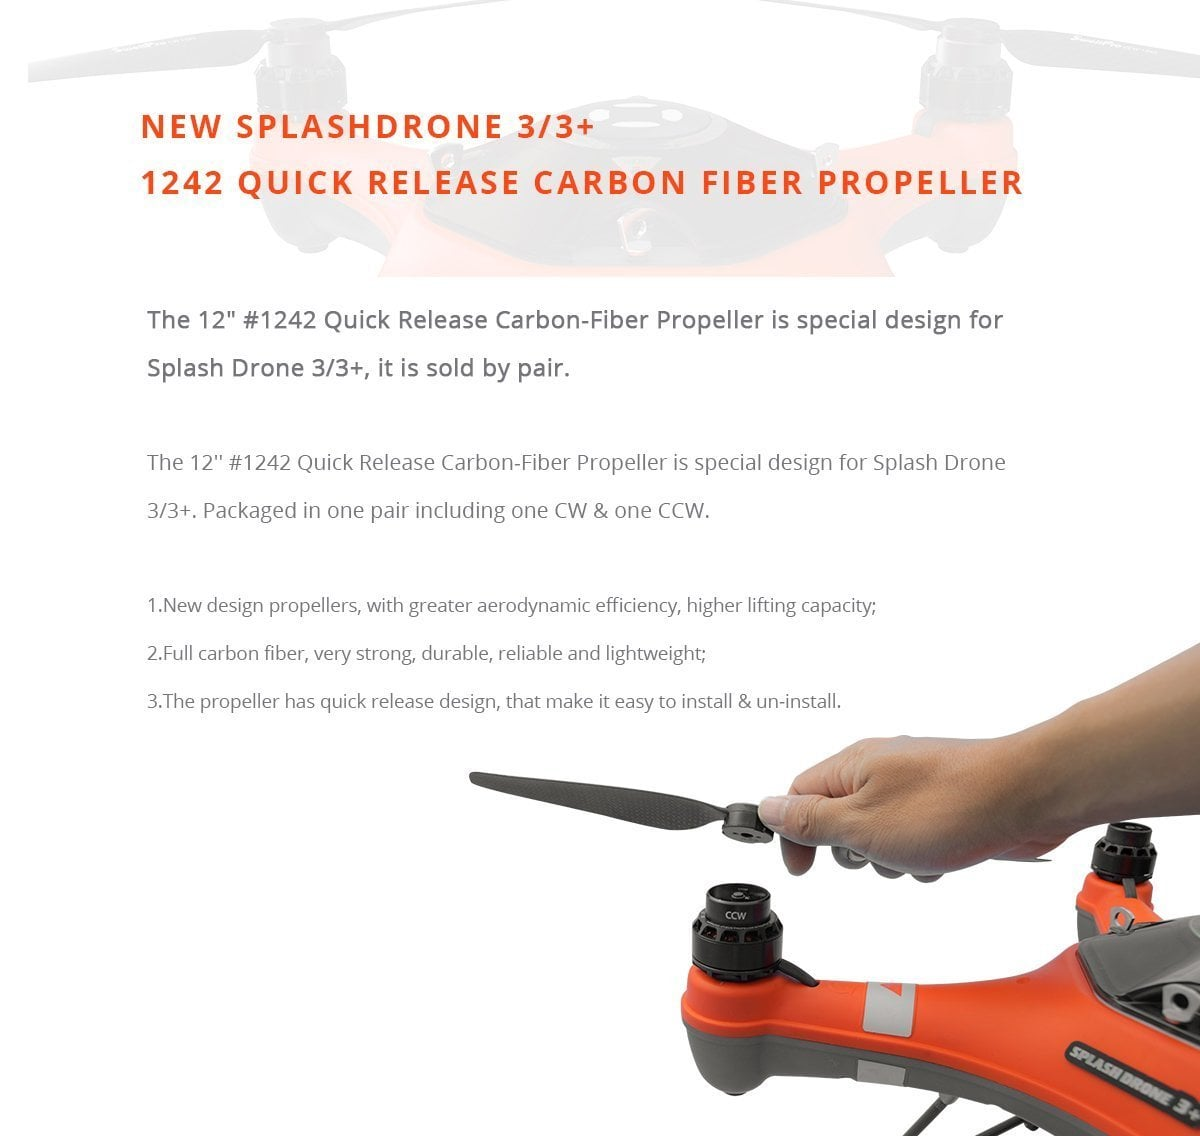 1242 Quick Release Carbon Fiber Propeller – Splash Drone 3+ Brochure